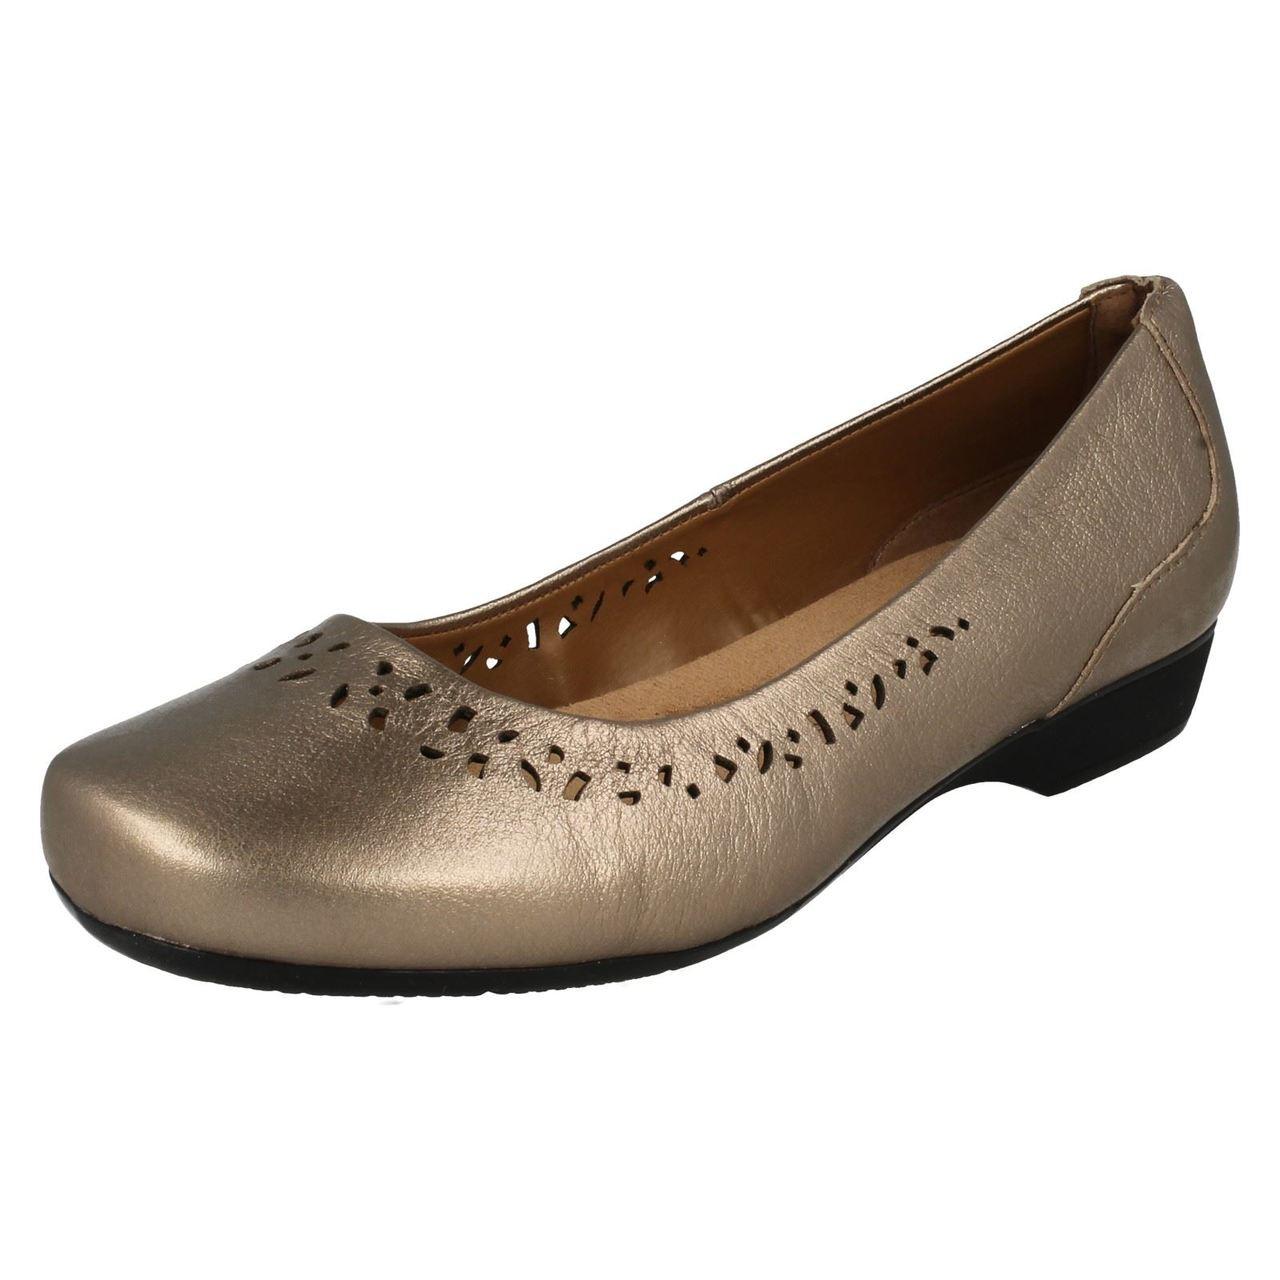 Ladies Clarks Cushion Soft Shoes